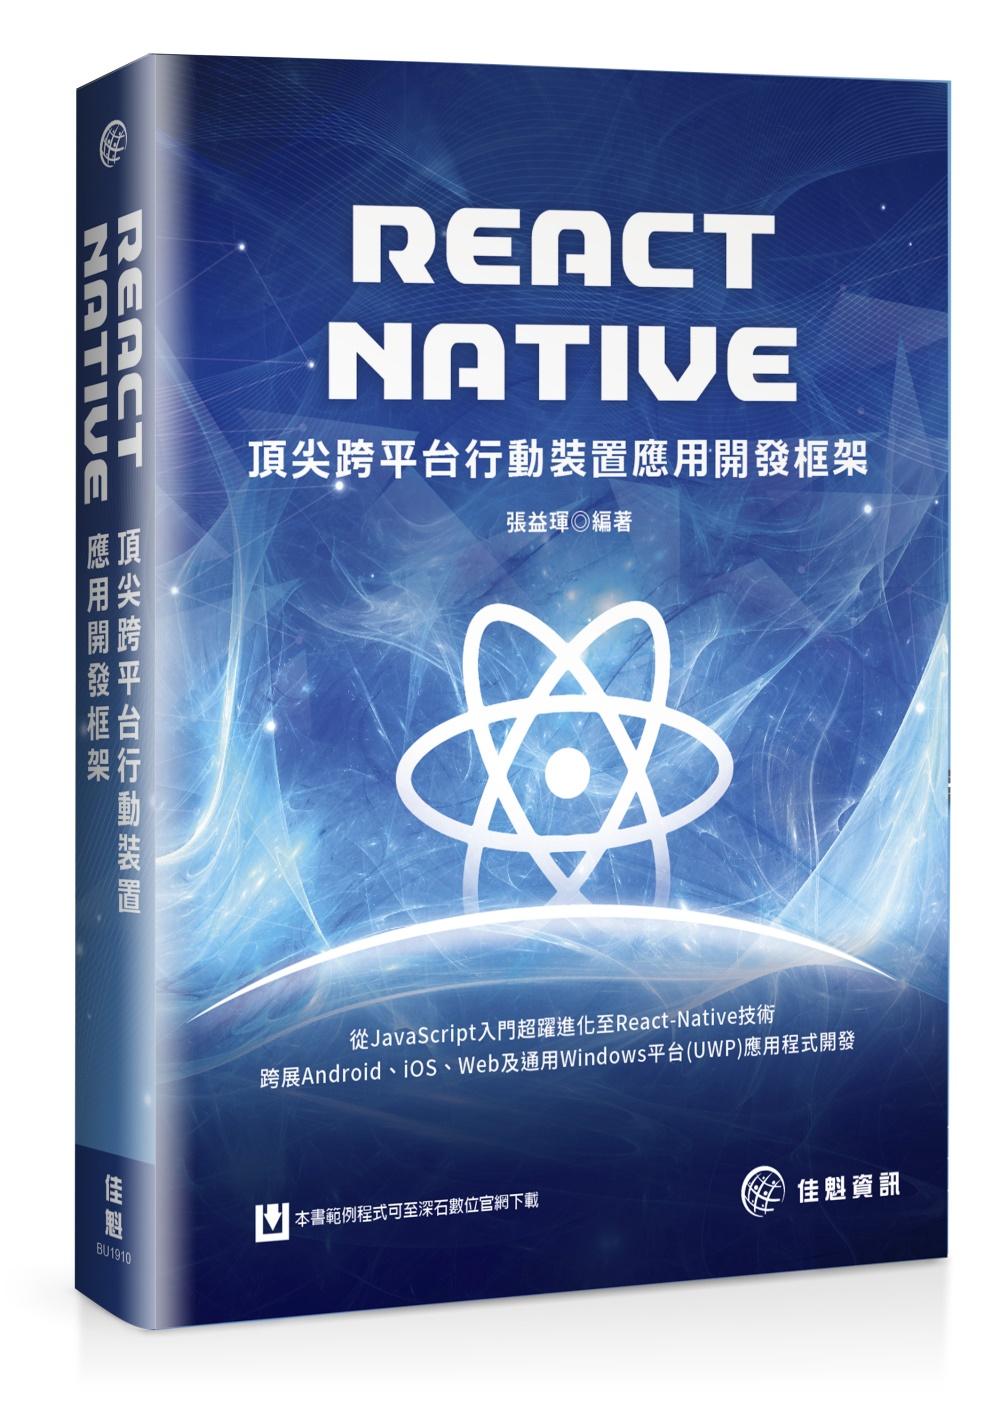 React Native 頂尖跨平台行動裝置應用開發框架